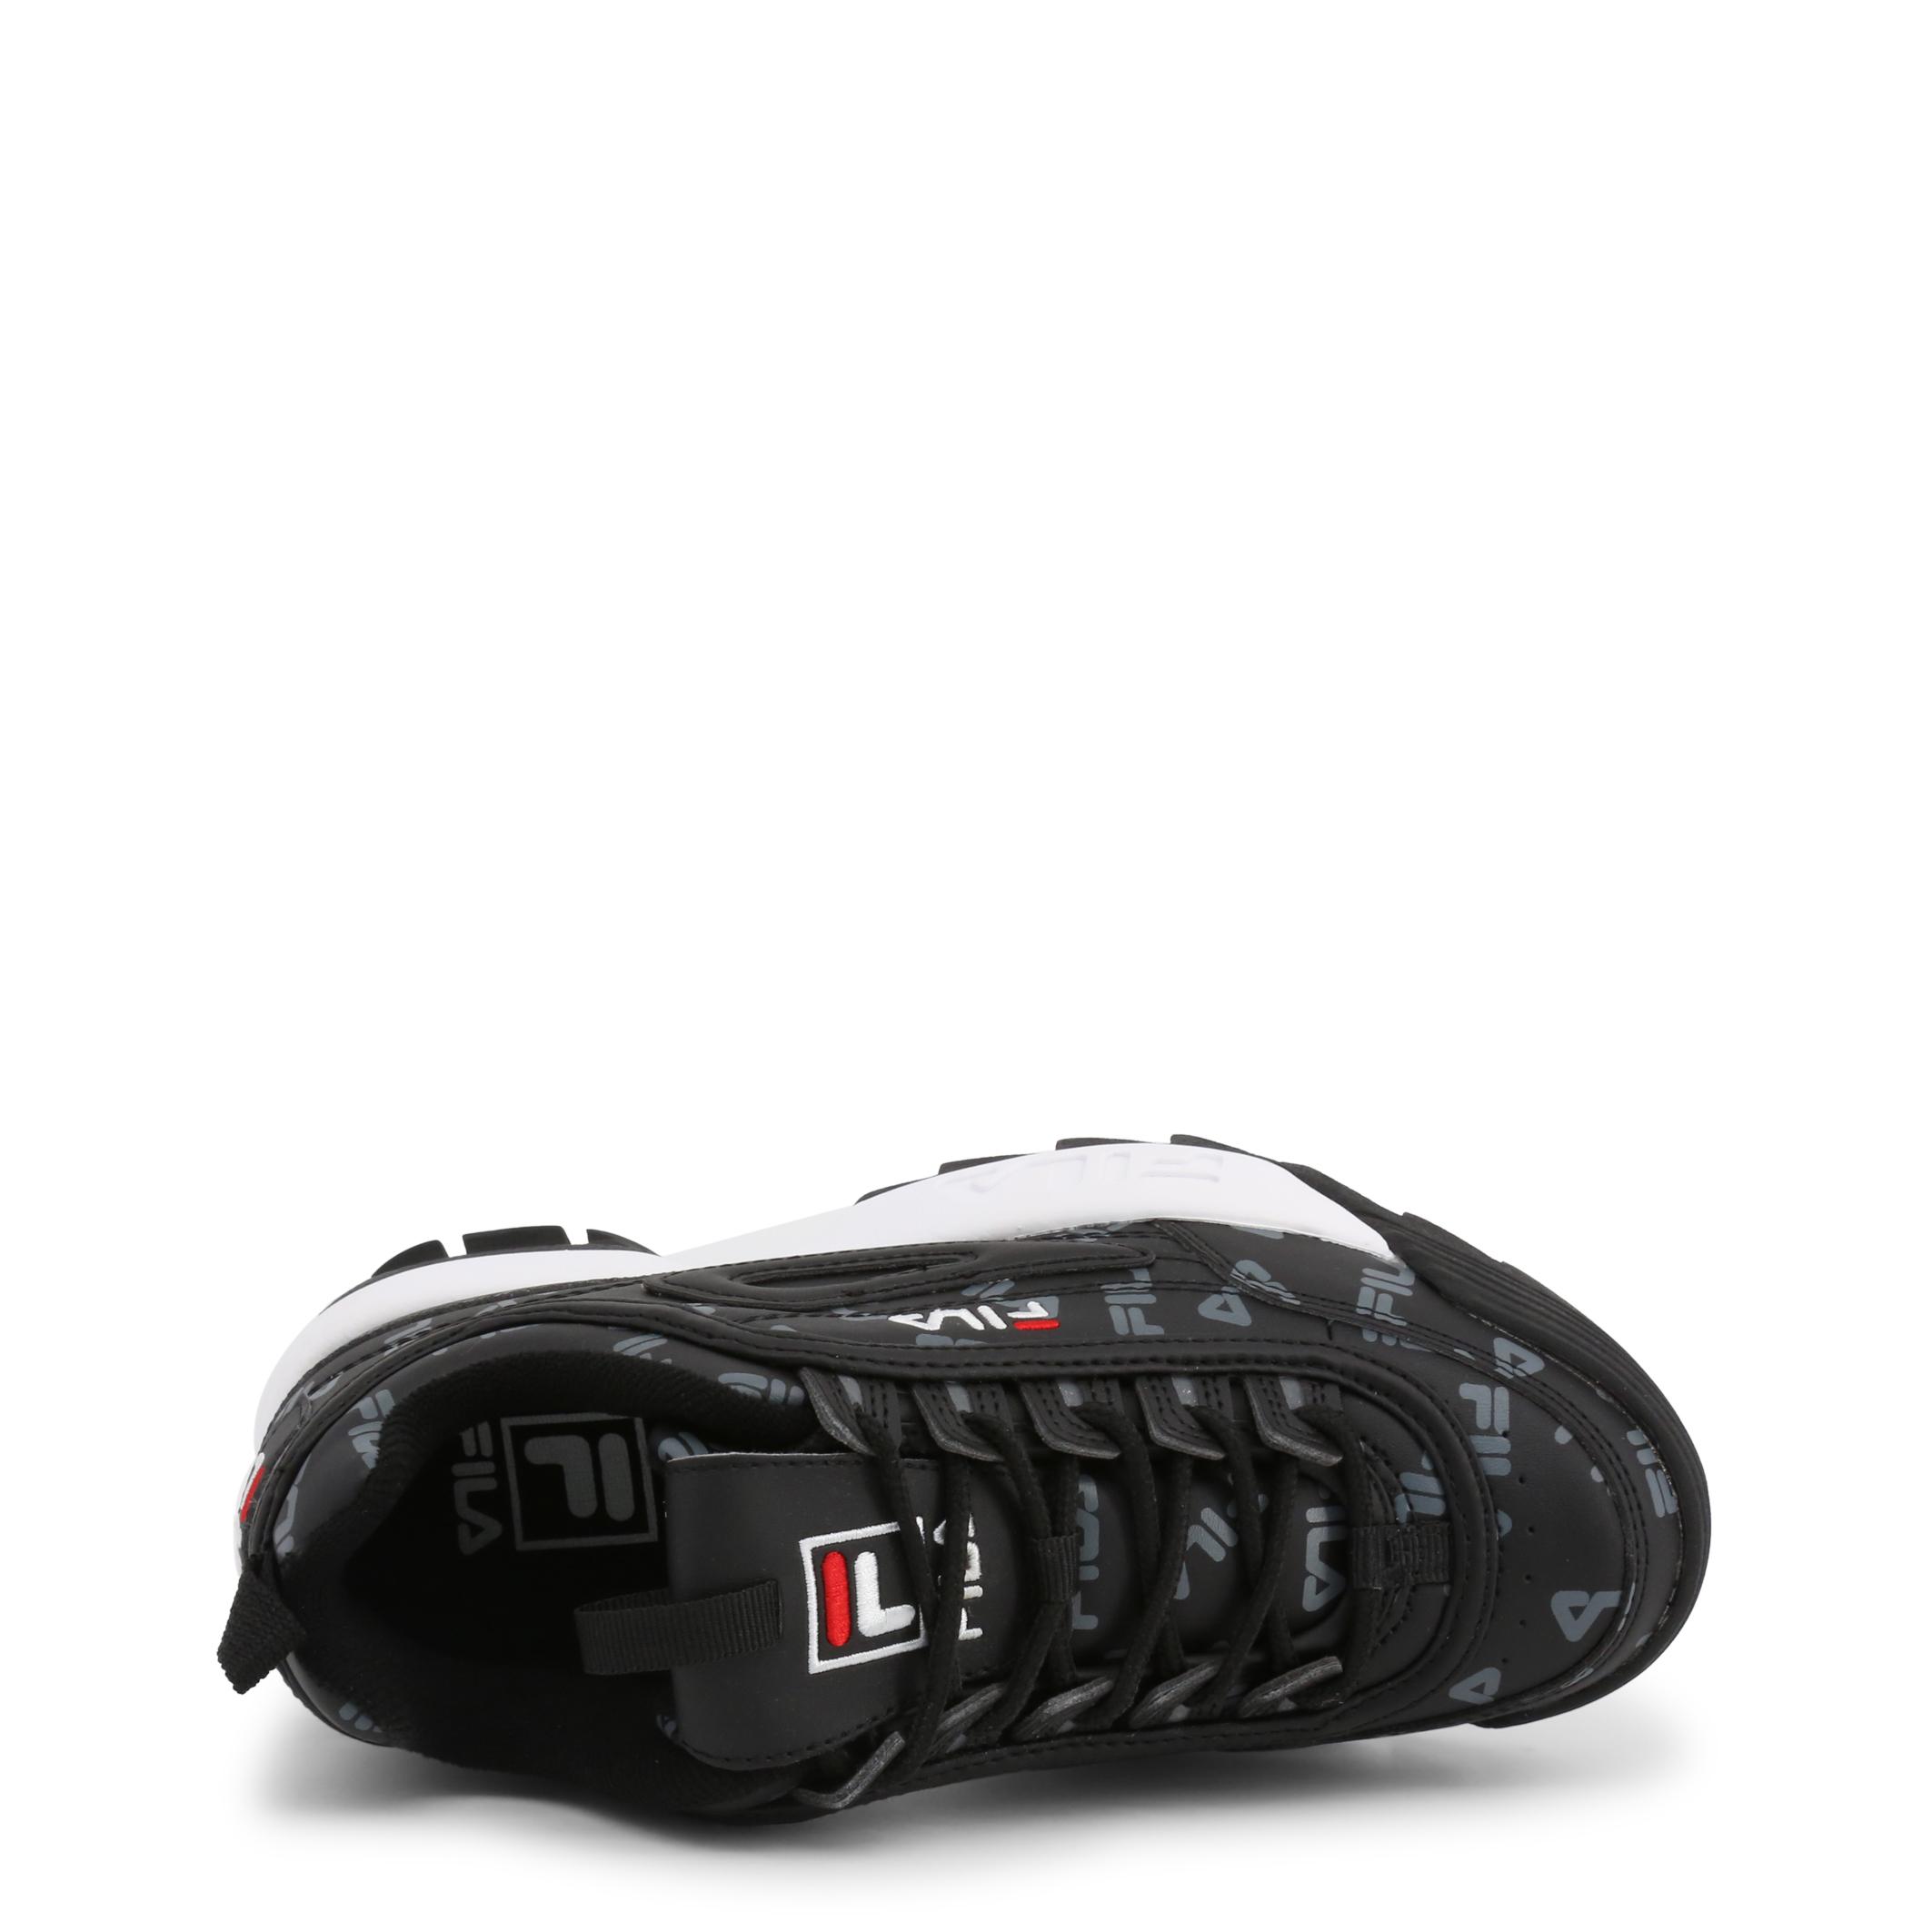 Baskets / Sneakers  Fila DISRUPTOR-LOGO-LOW_1010748 black